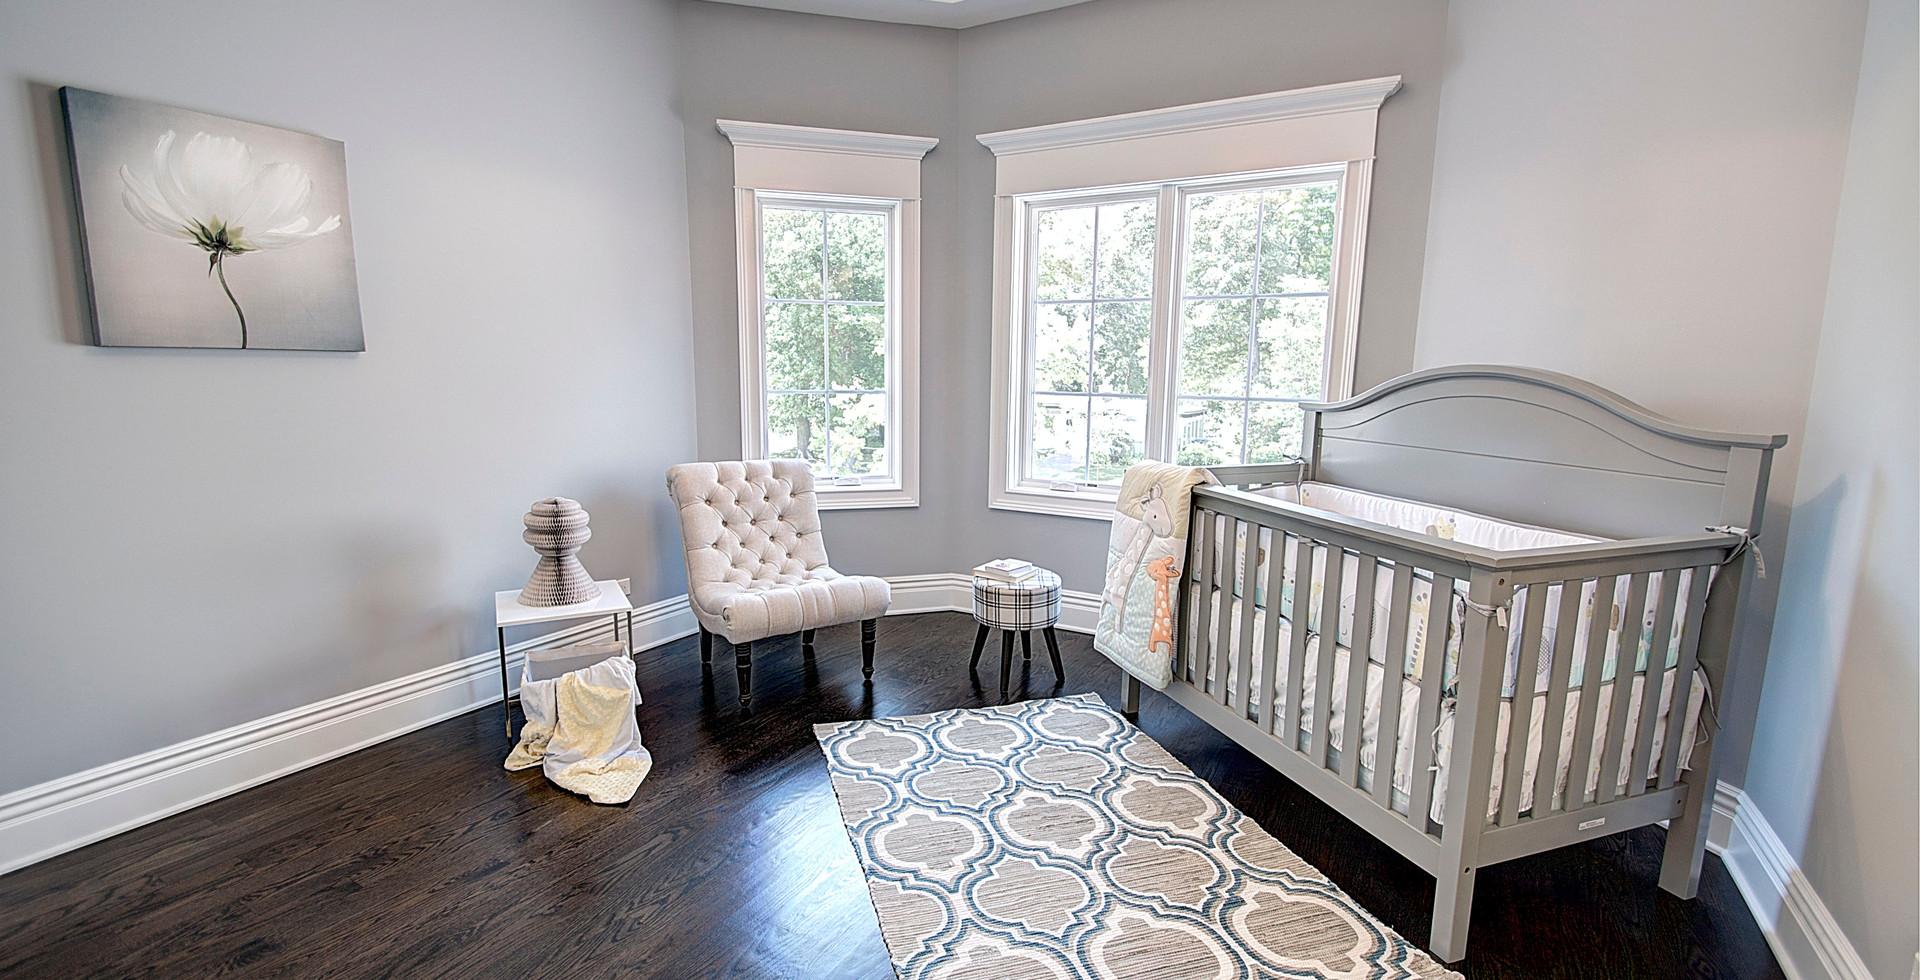 Bedroom in Hinsdale designed by MRM Home Design.jpg